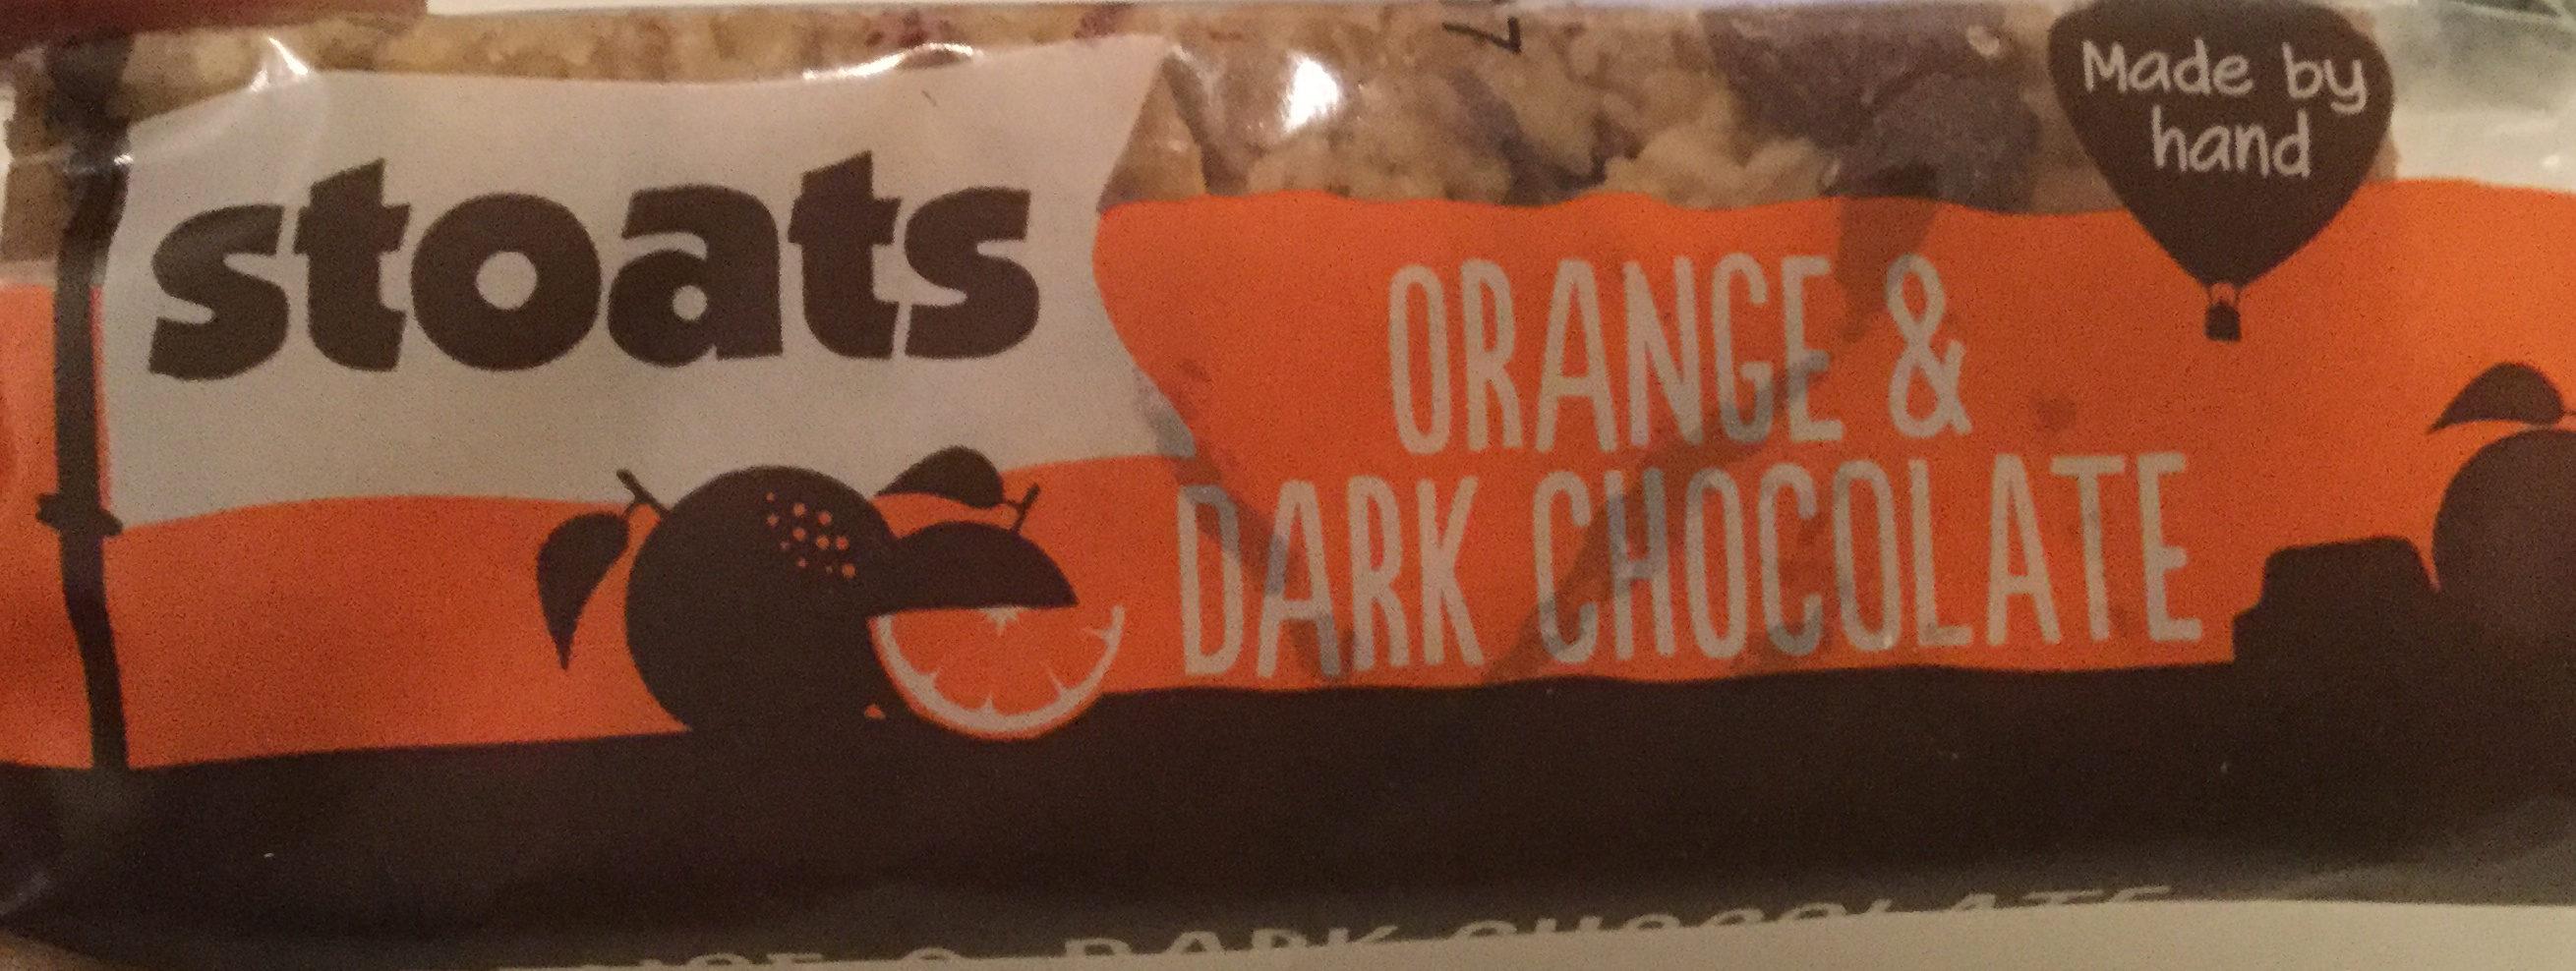 Porridge Oat Bar orange & dark chocolate - Product